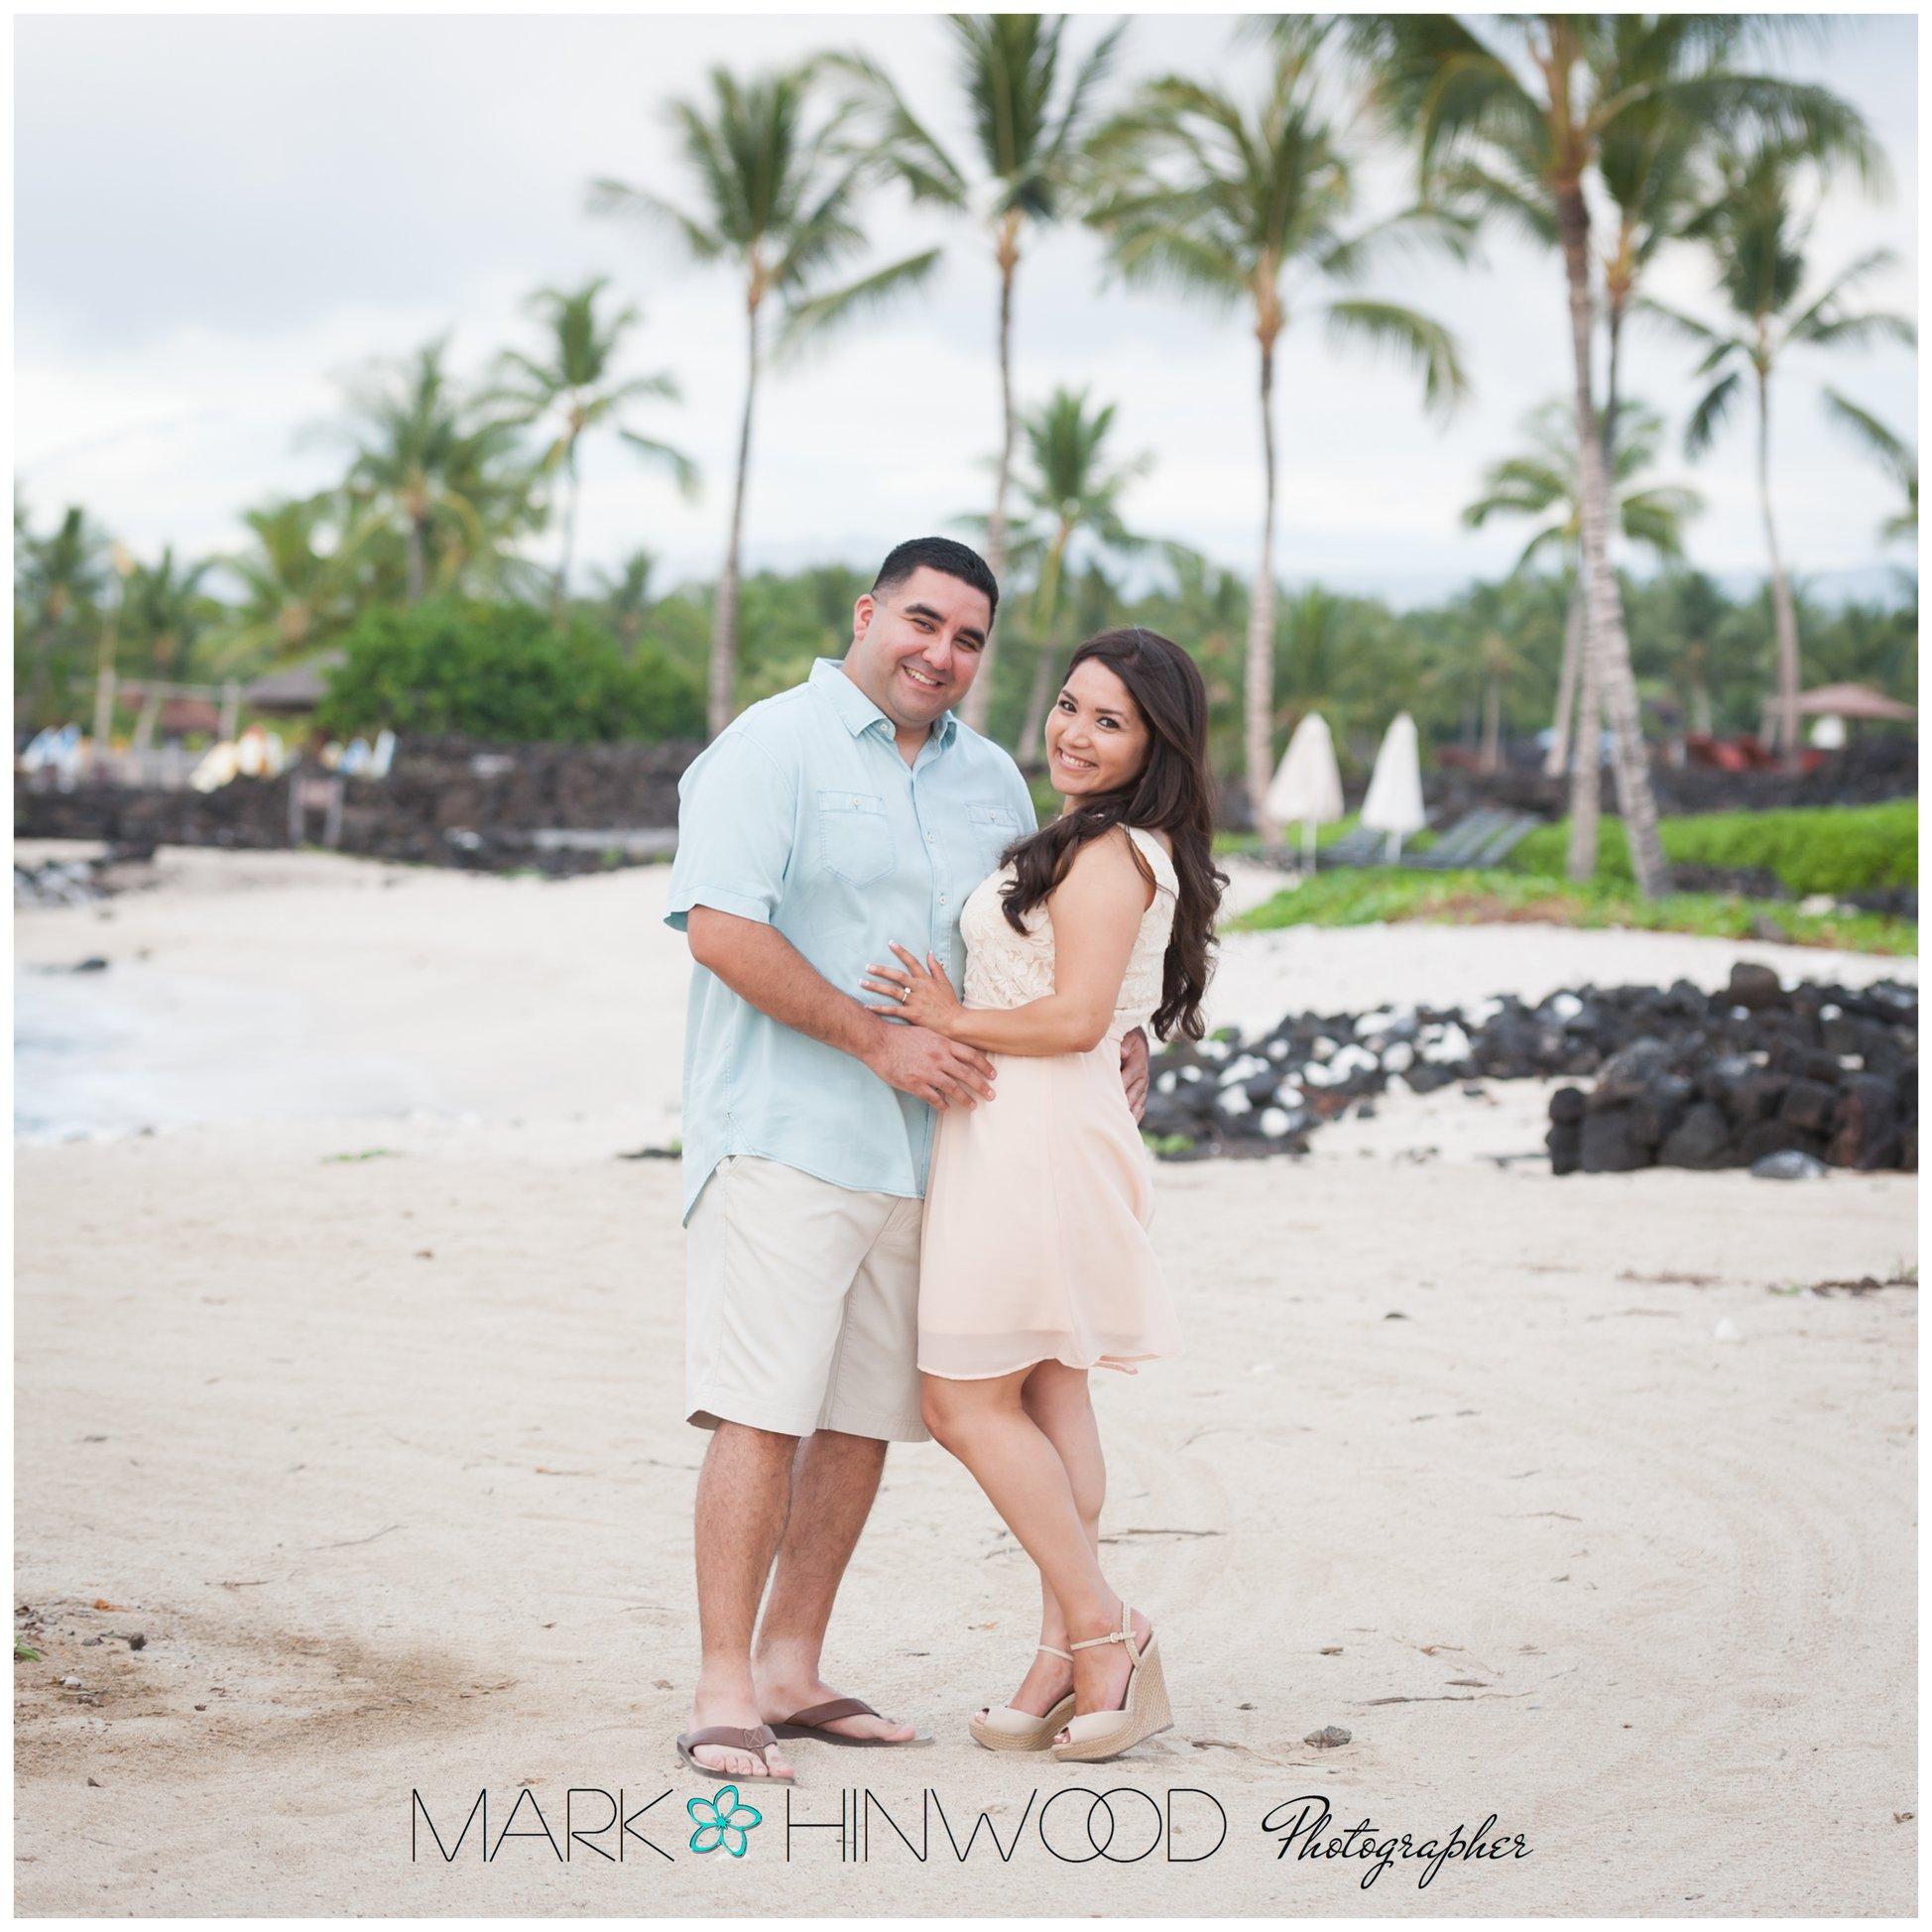 Hawaii engagment photography 7